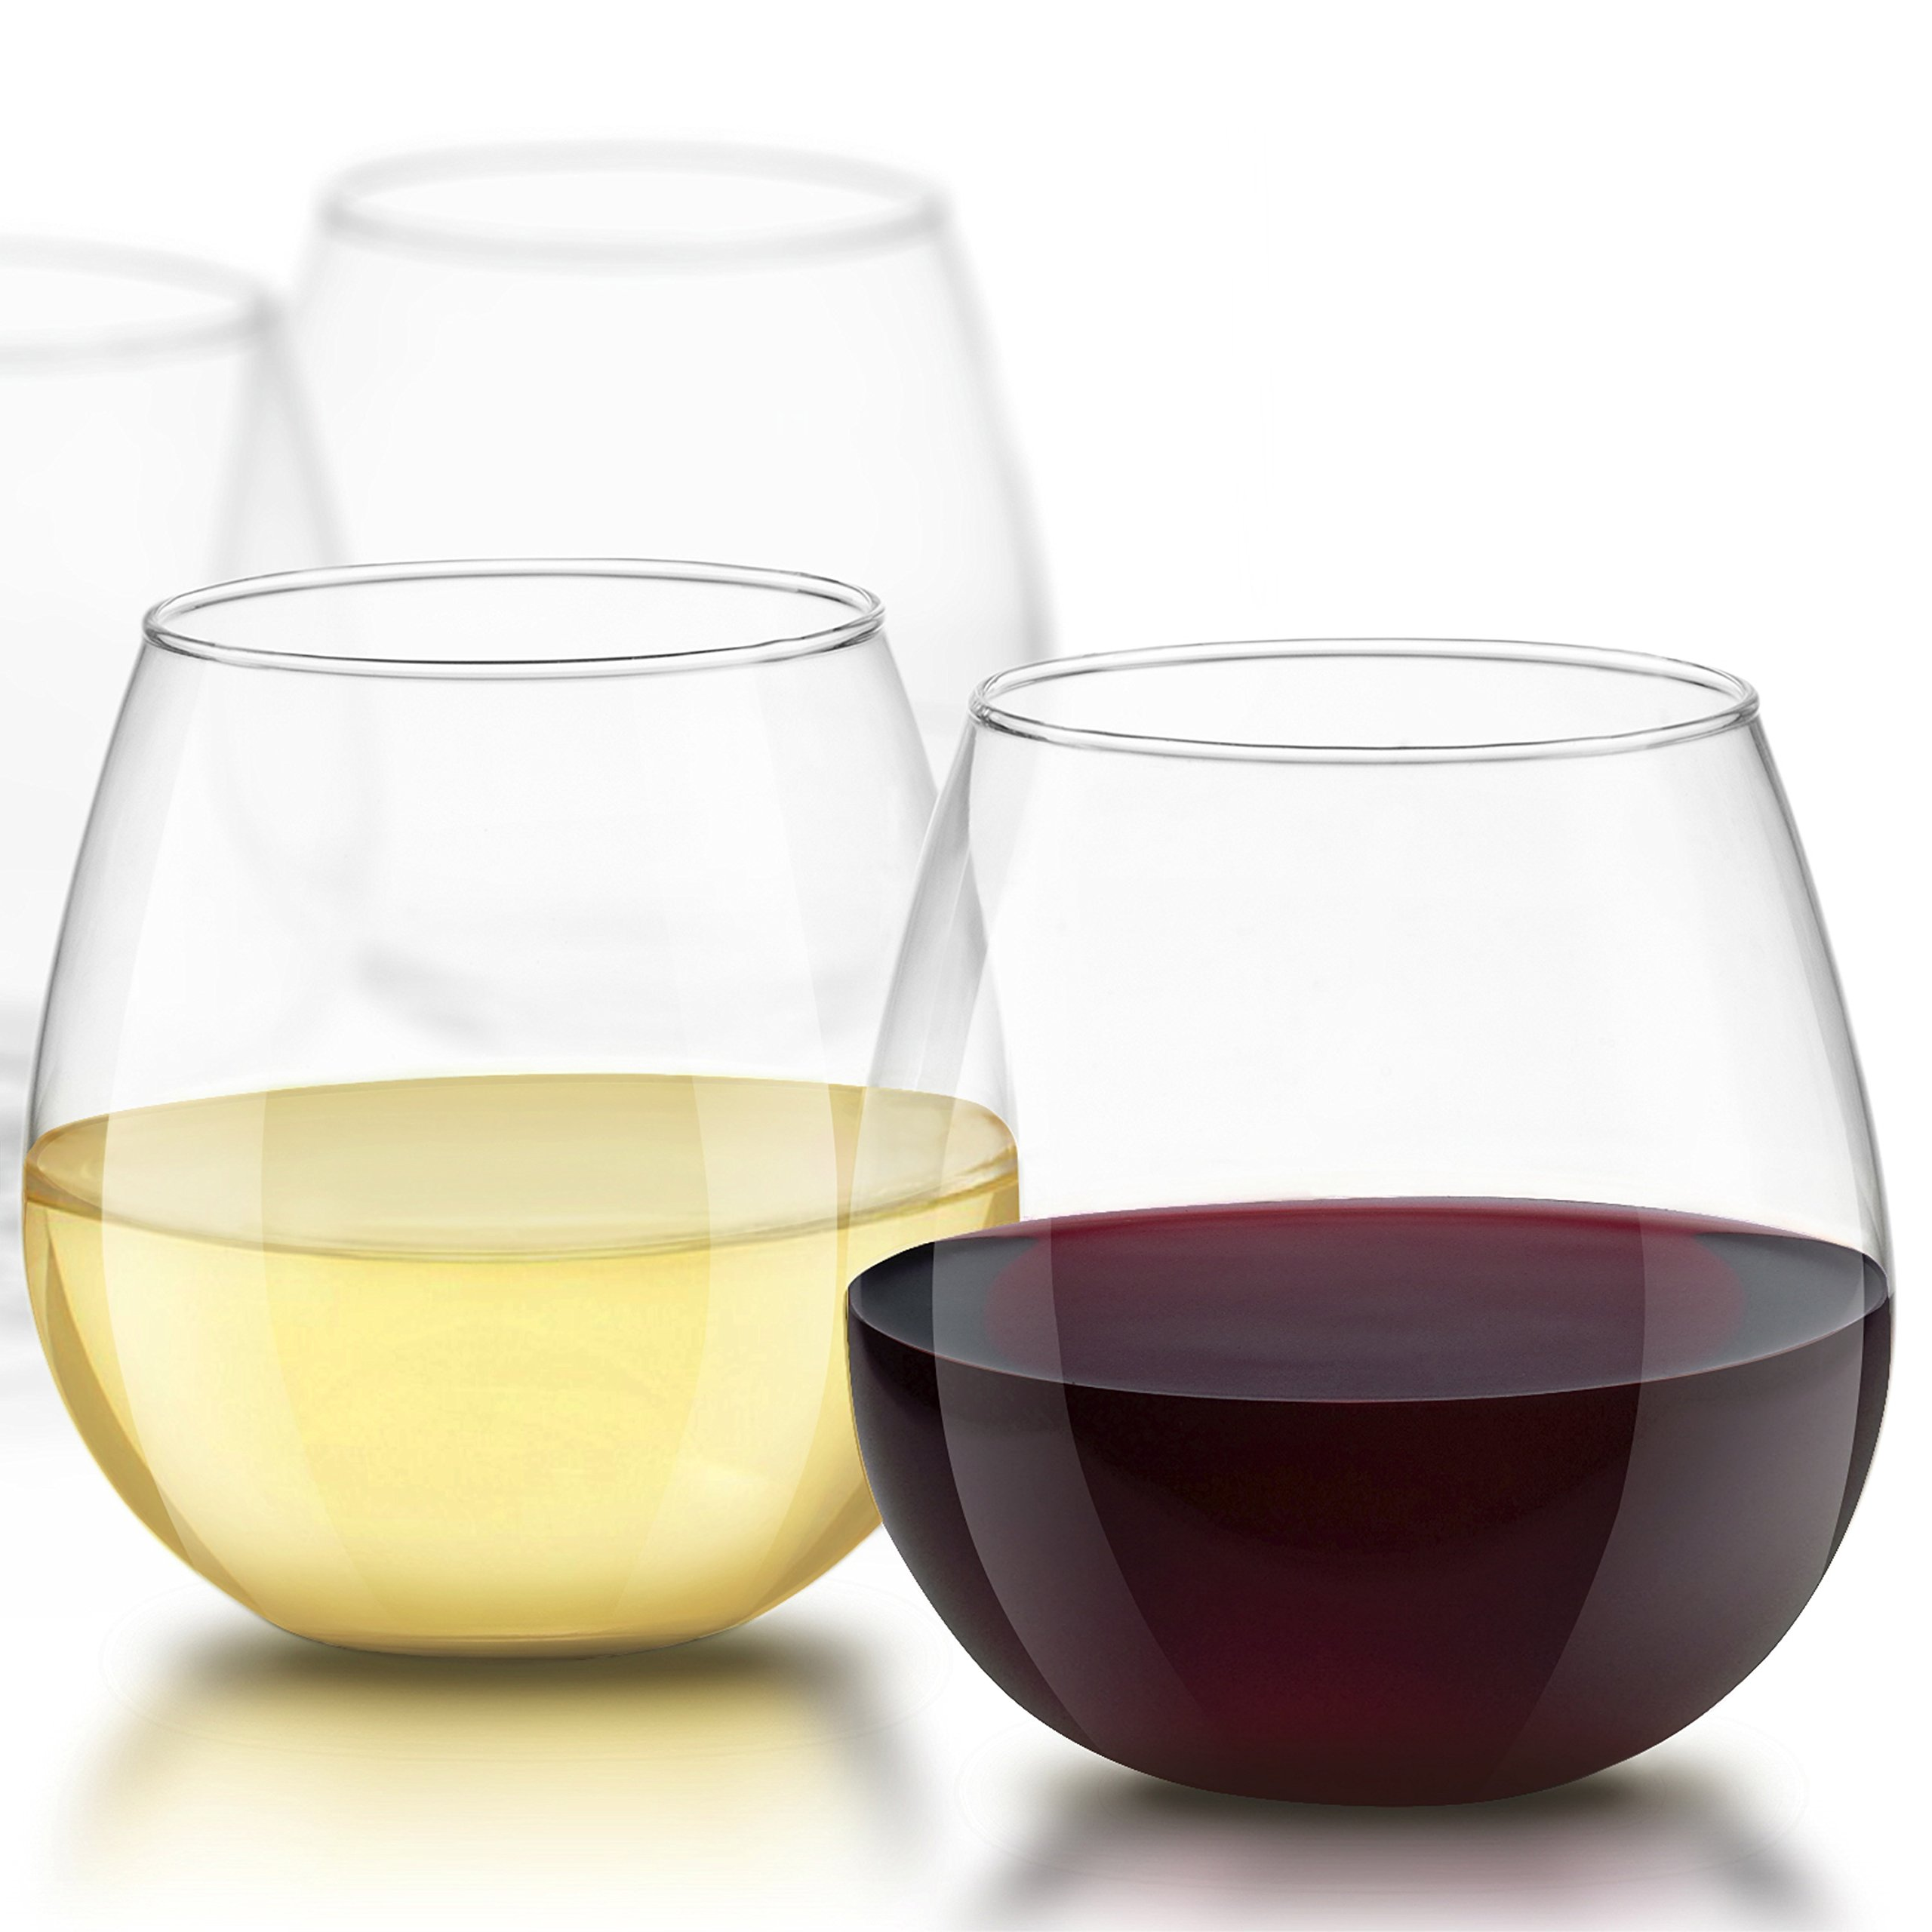 JoyJolt Spirits Stemless Wine Glasses for Red or White Wine (Set of 4)-15-Ounces by JoyJolt